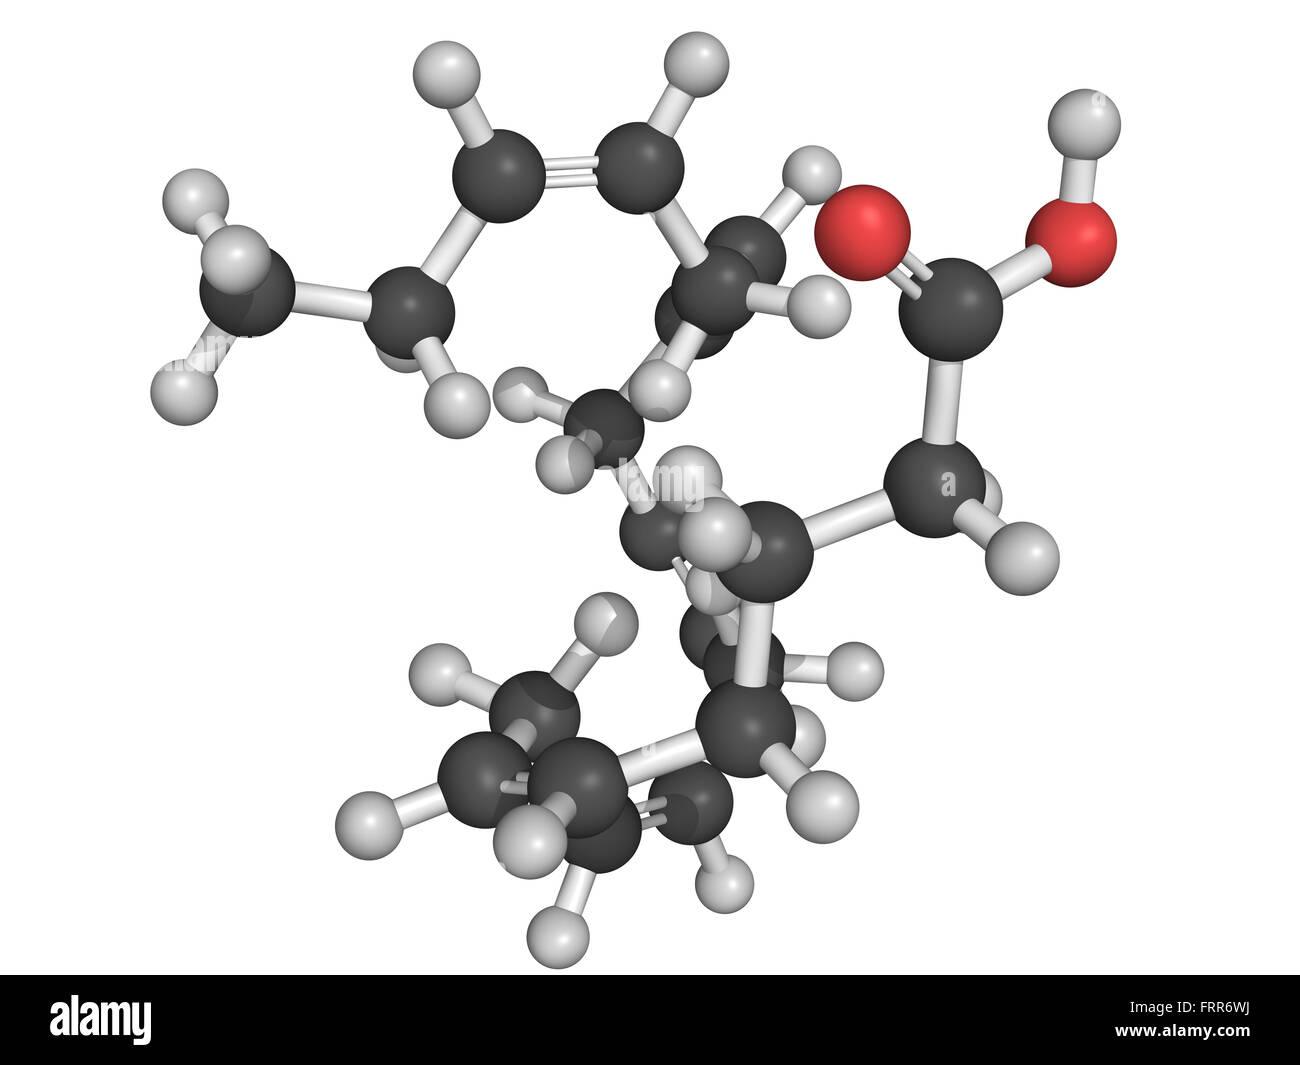 eicosapentaenoic acid epa omega 3 fatty acid molecular model epa stock photo 100699246 alamy. Black Bedroom Furniture Sets. Home Design Ideas